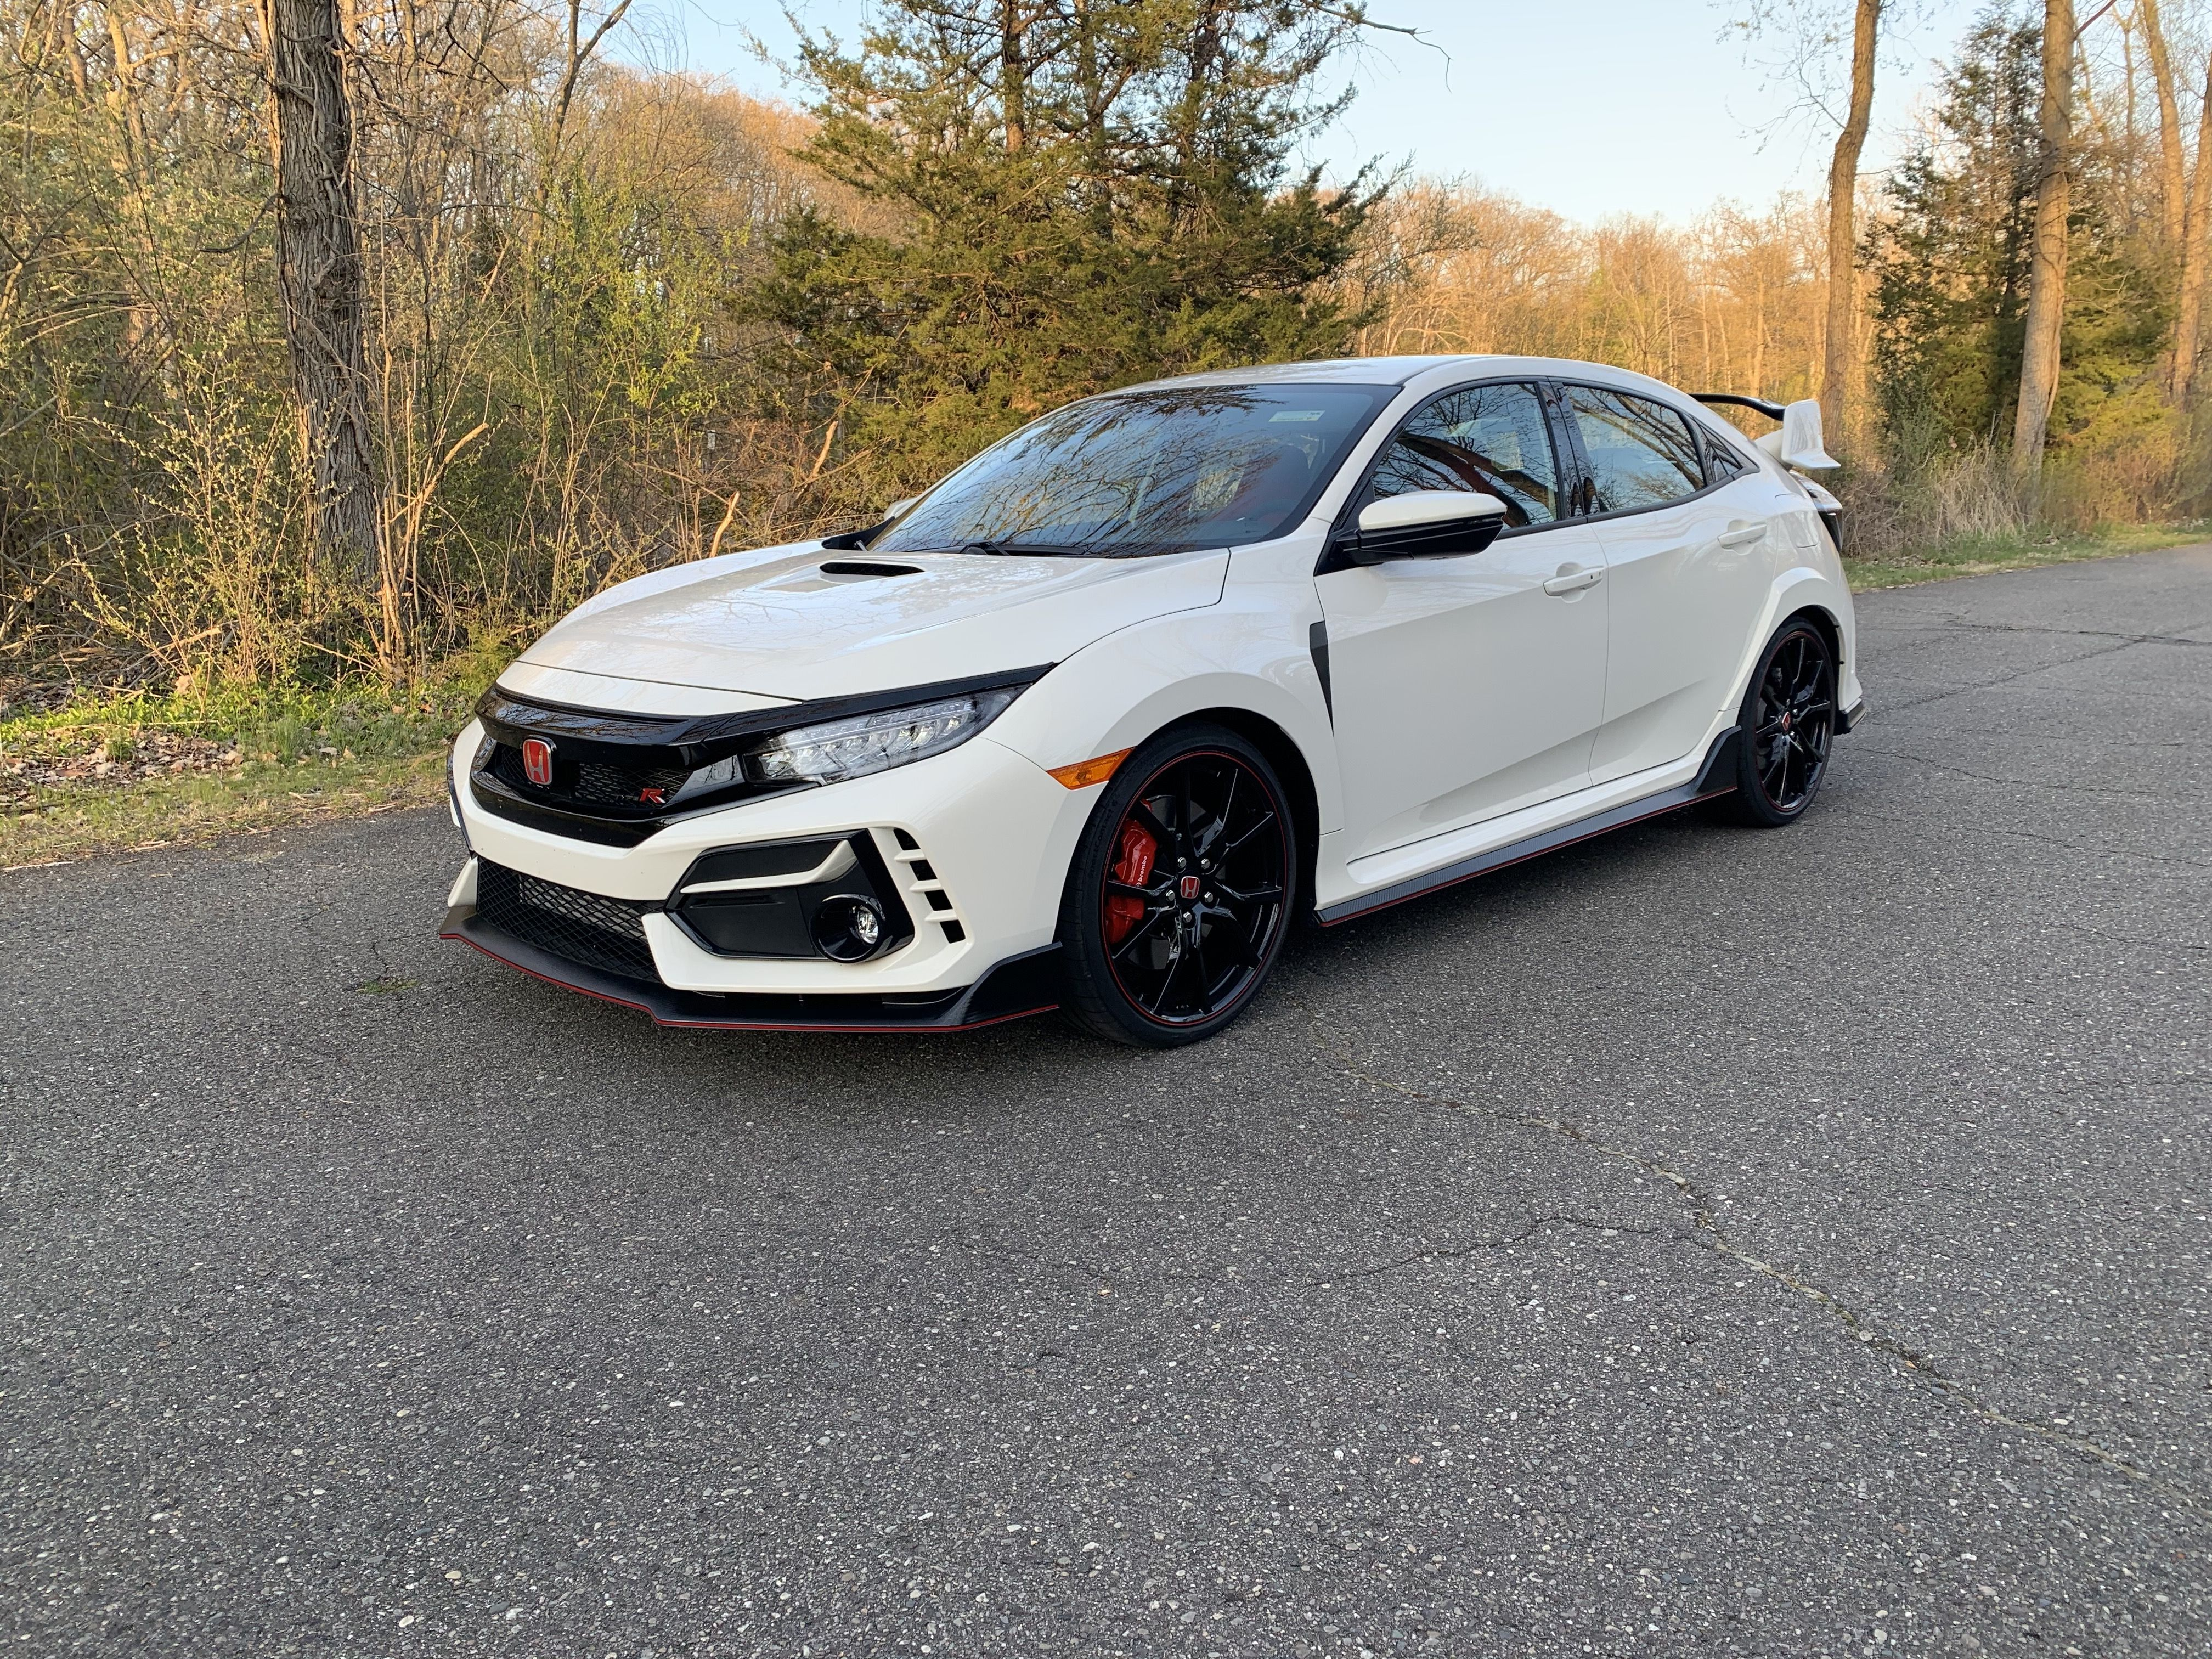 Gallery Honda Civic Type R In Championship White